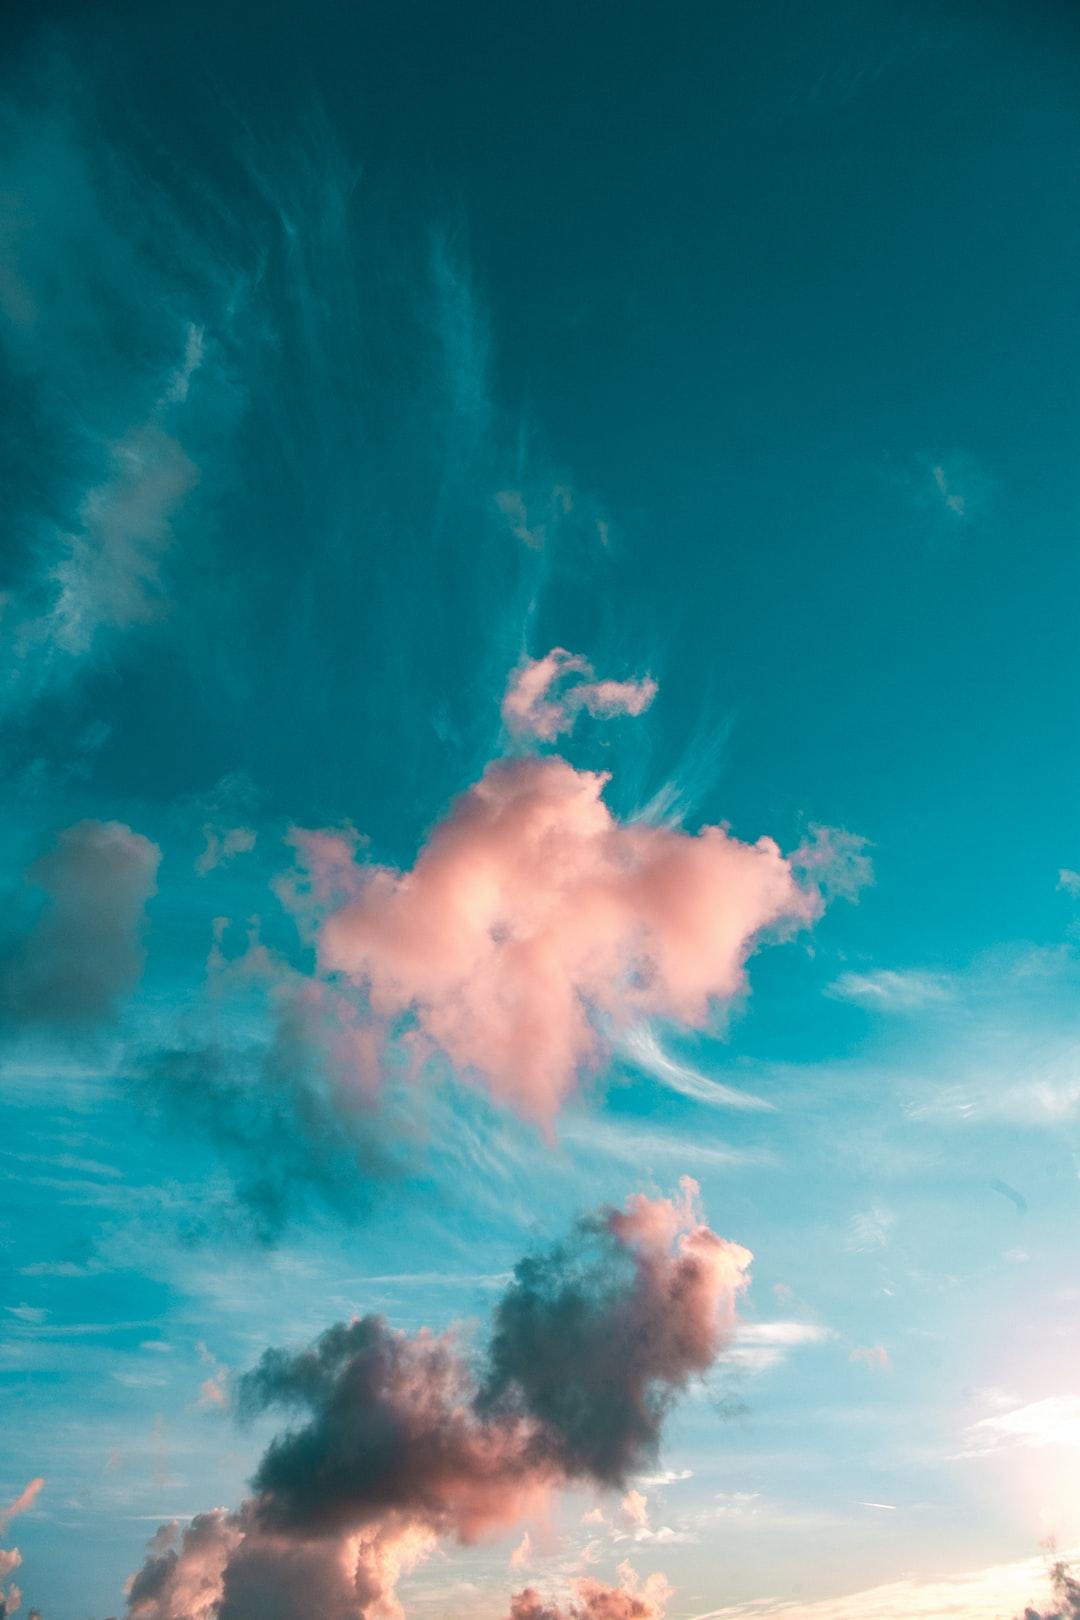 Cotton Cloud Pictures Download Free Images On Unsplash